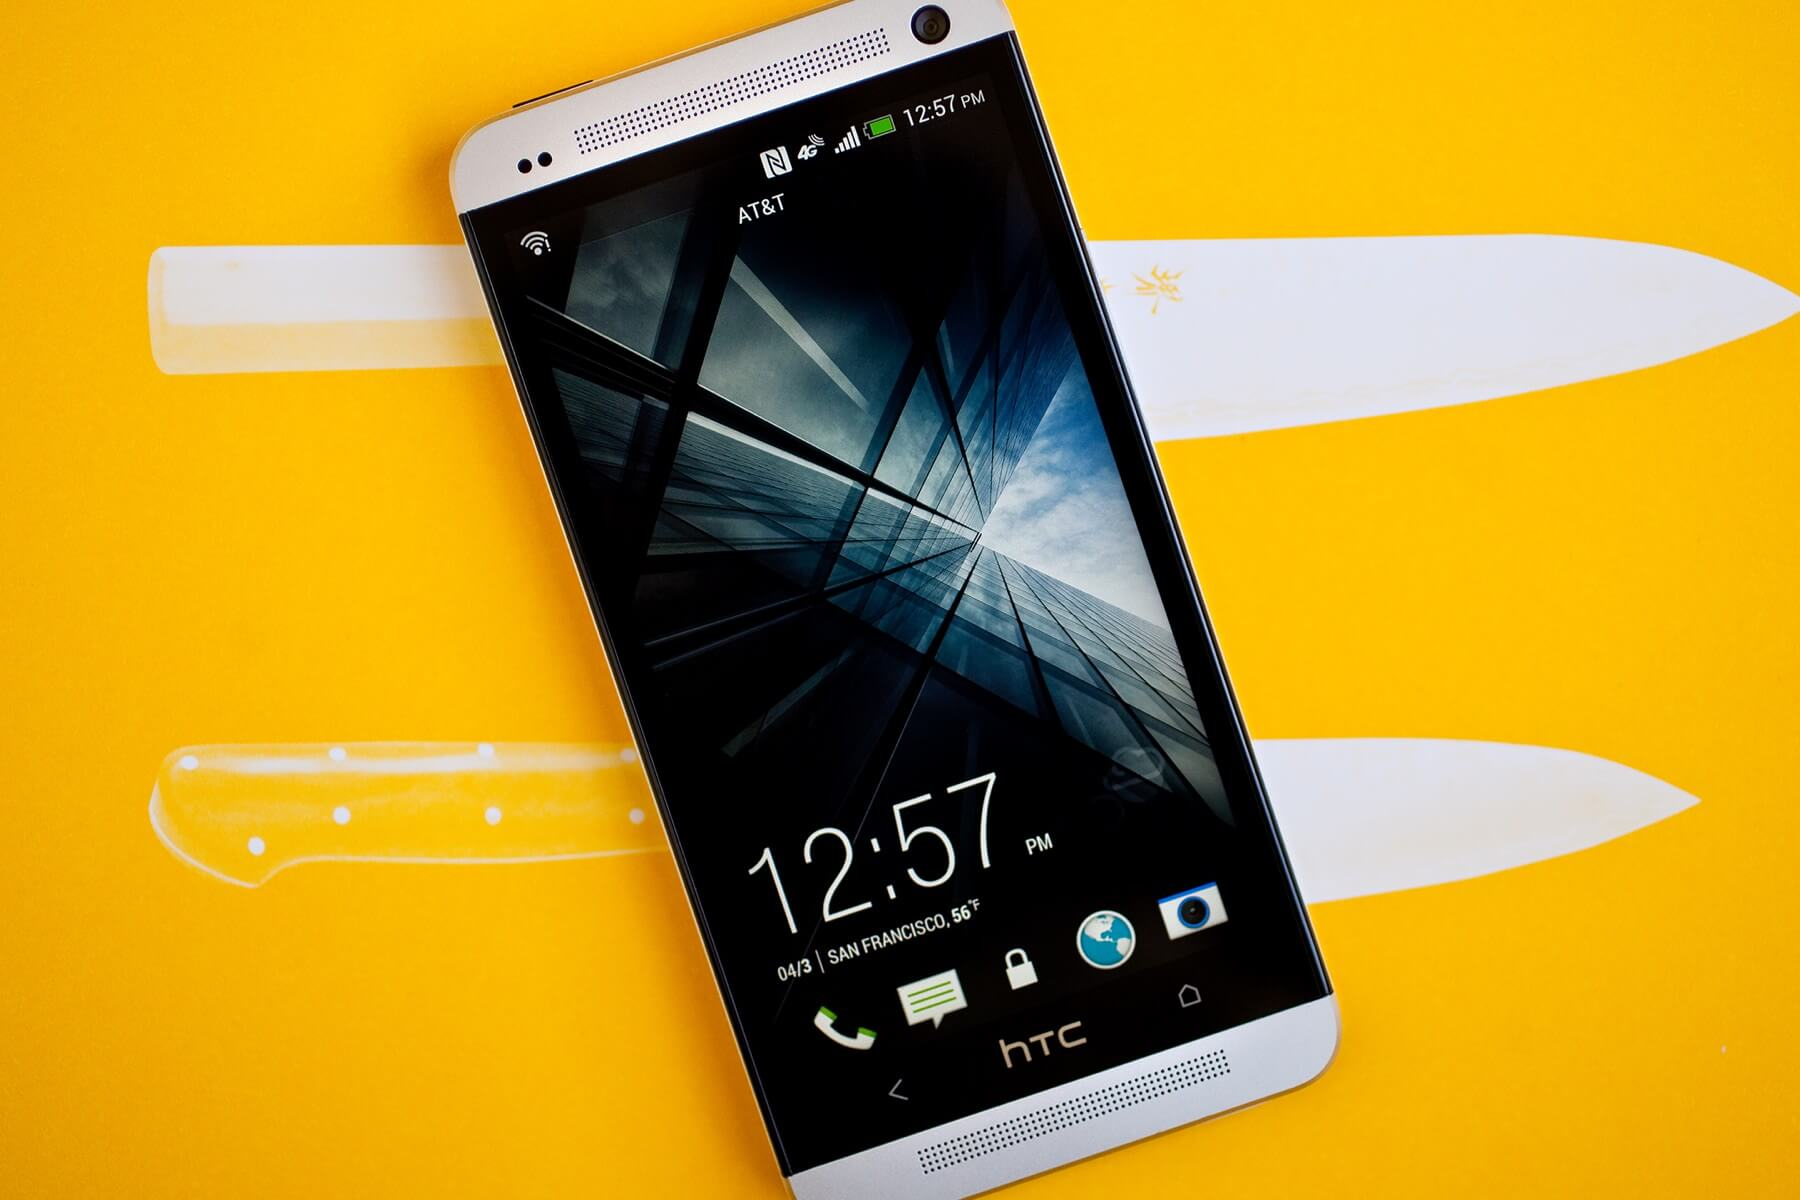 Продажи устройств HTC в 2015 году упали на 35%